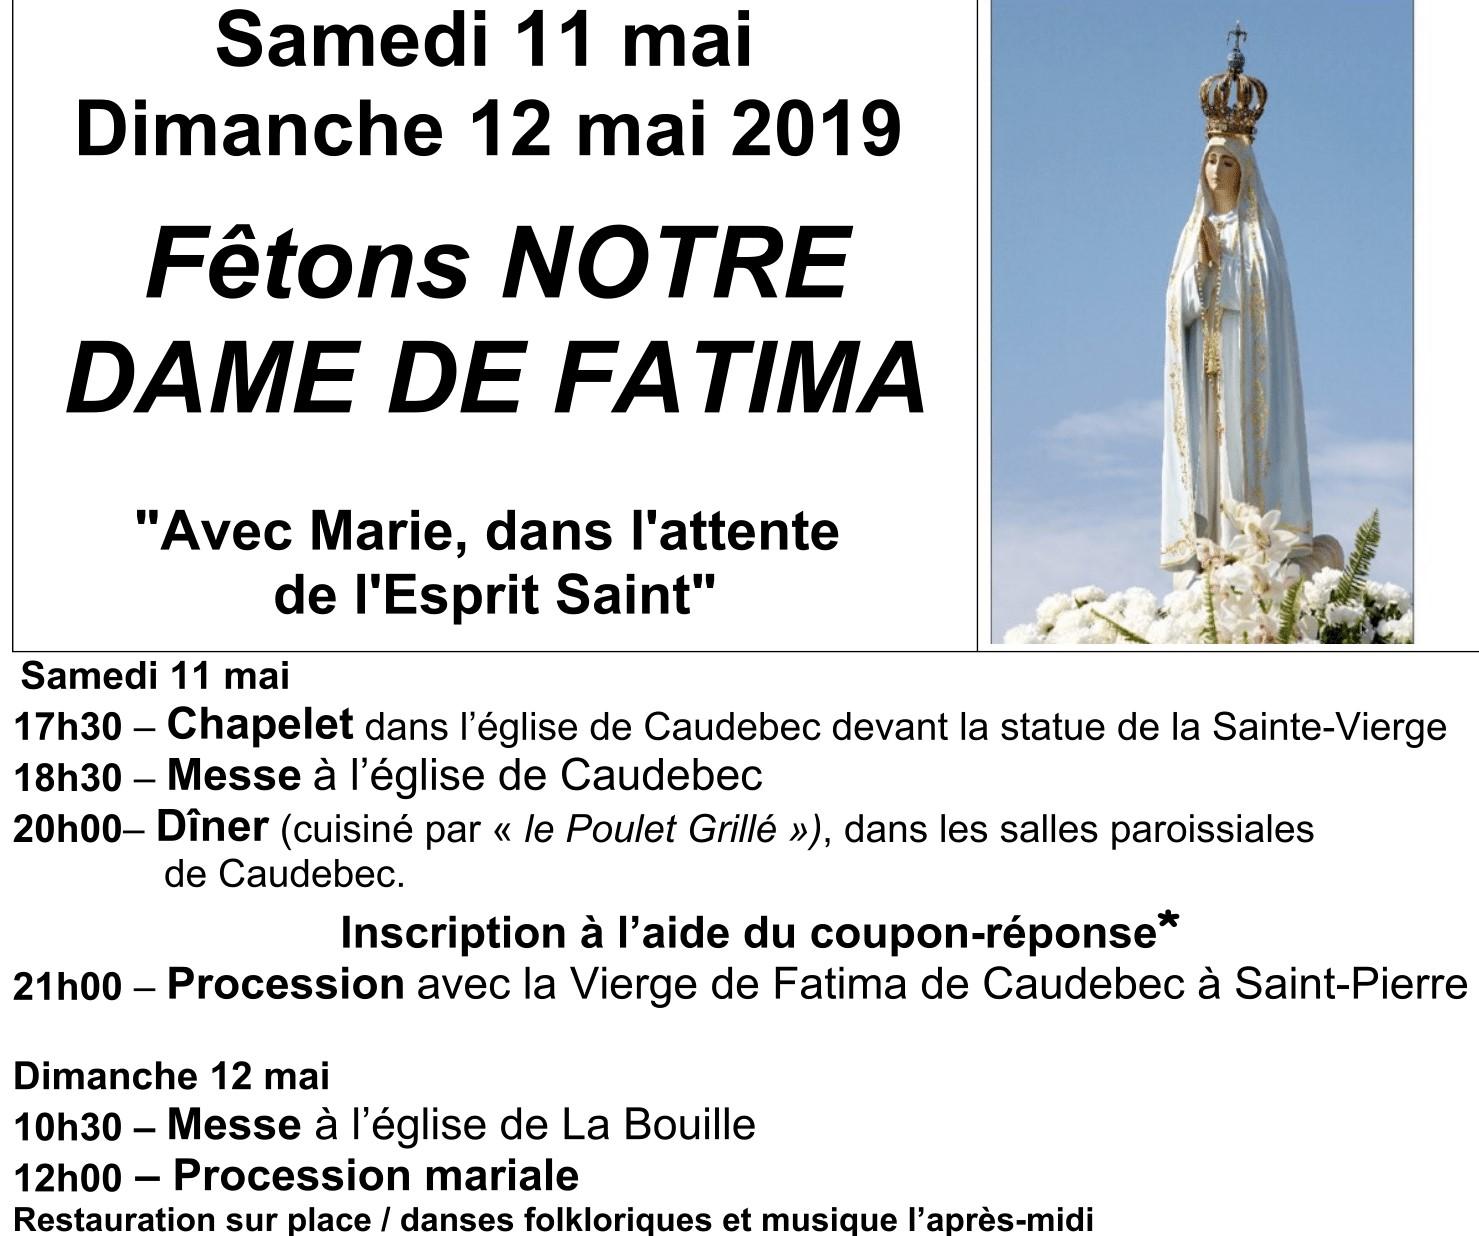 Fatima 12 mai